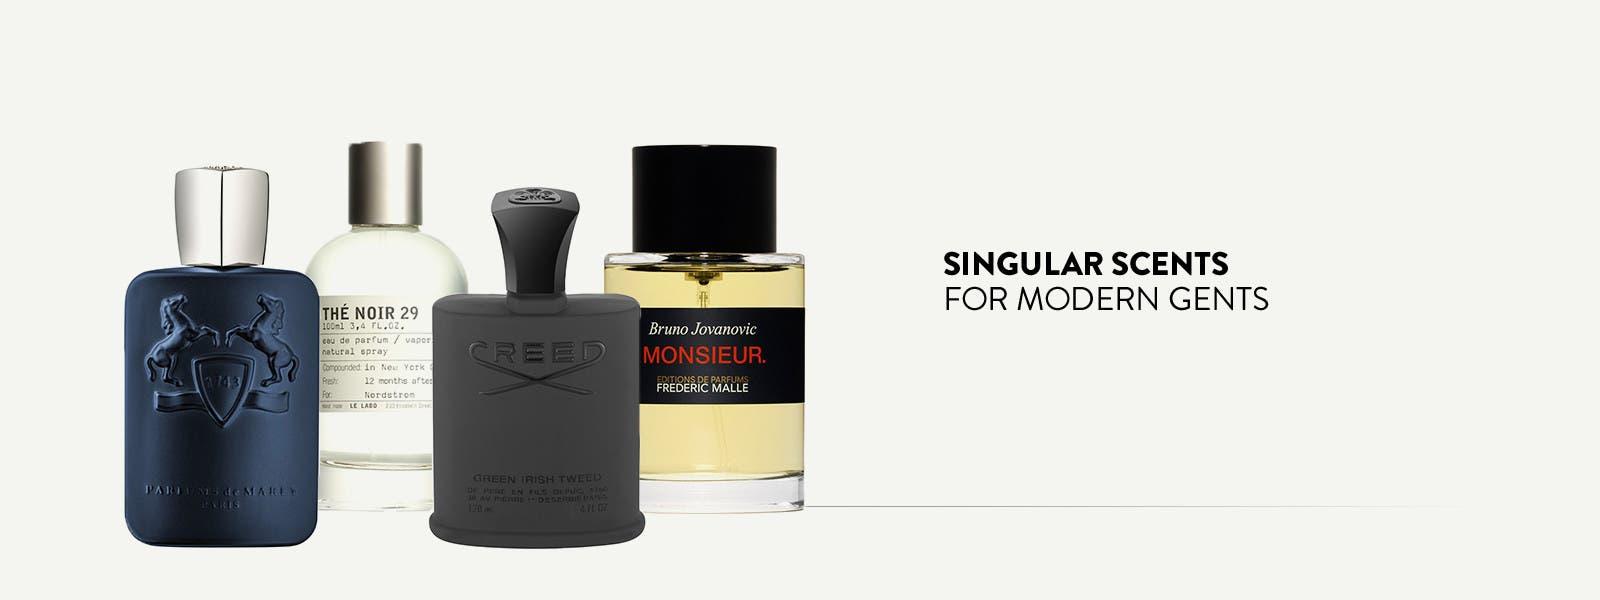 Singular scents for modern gents.